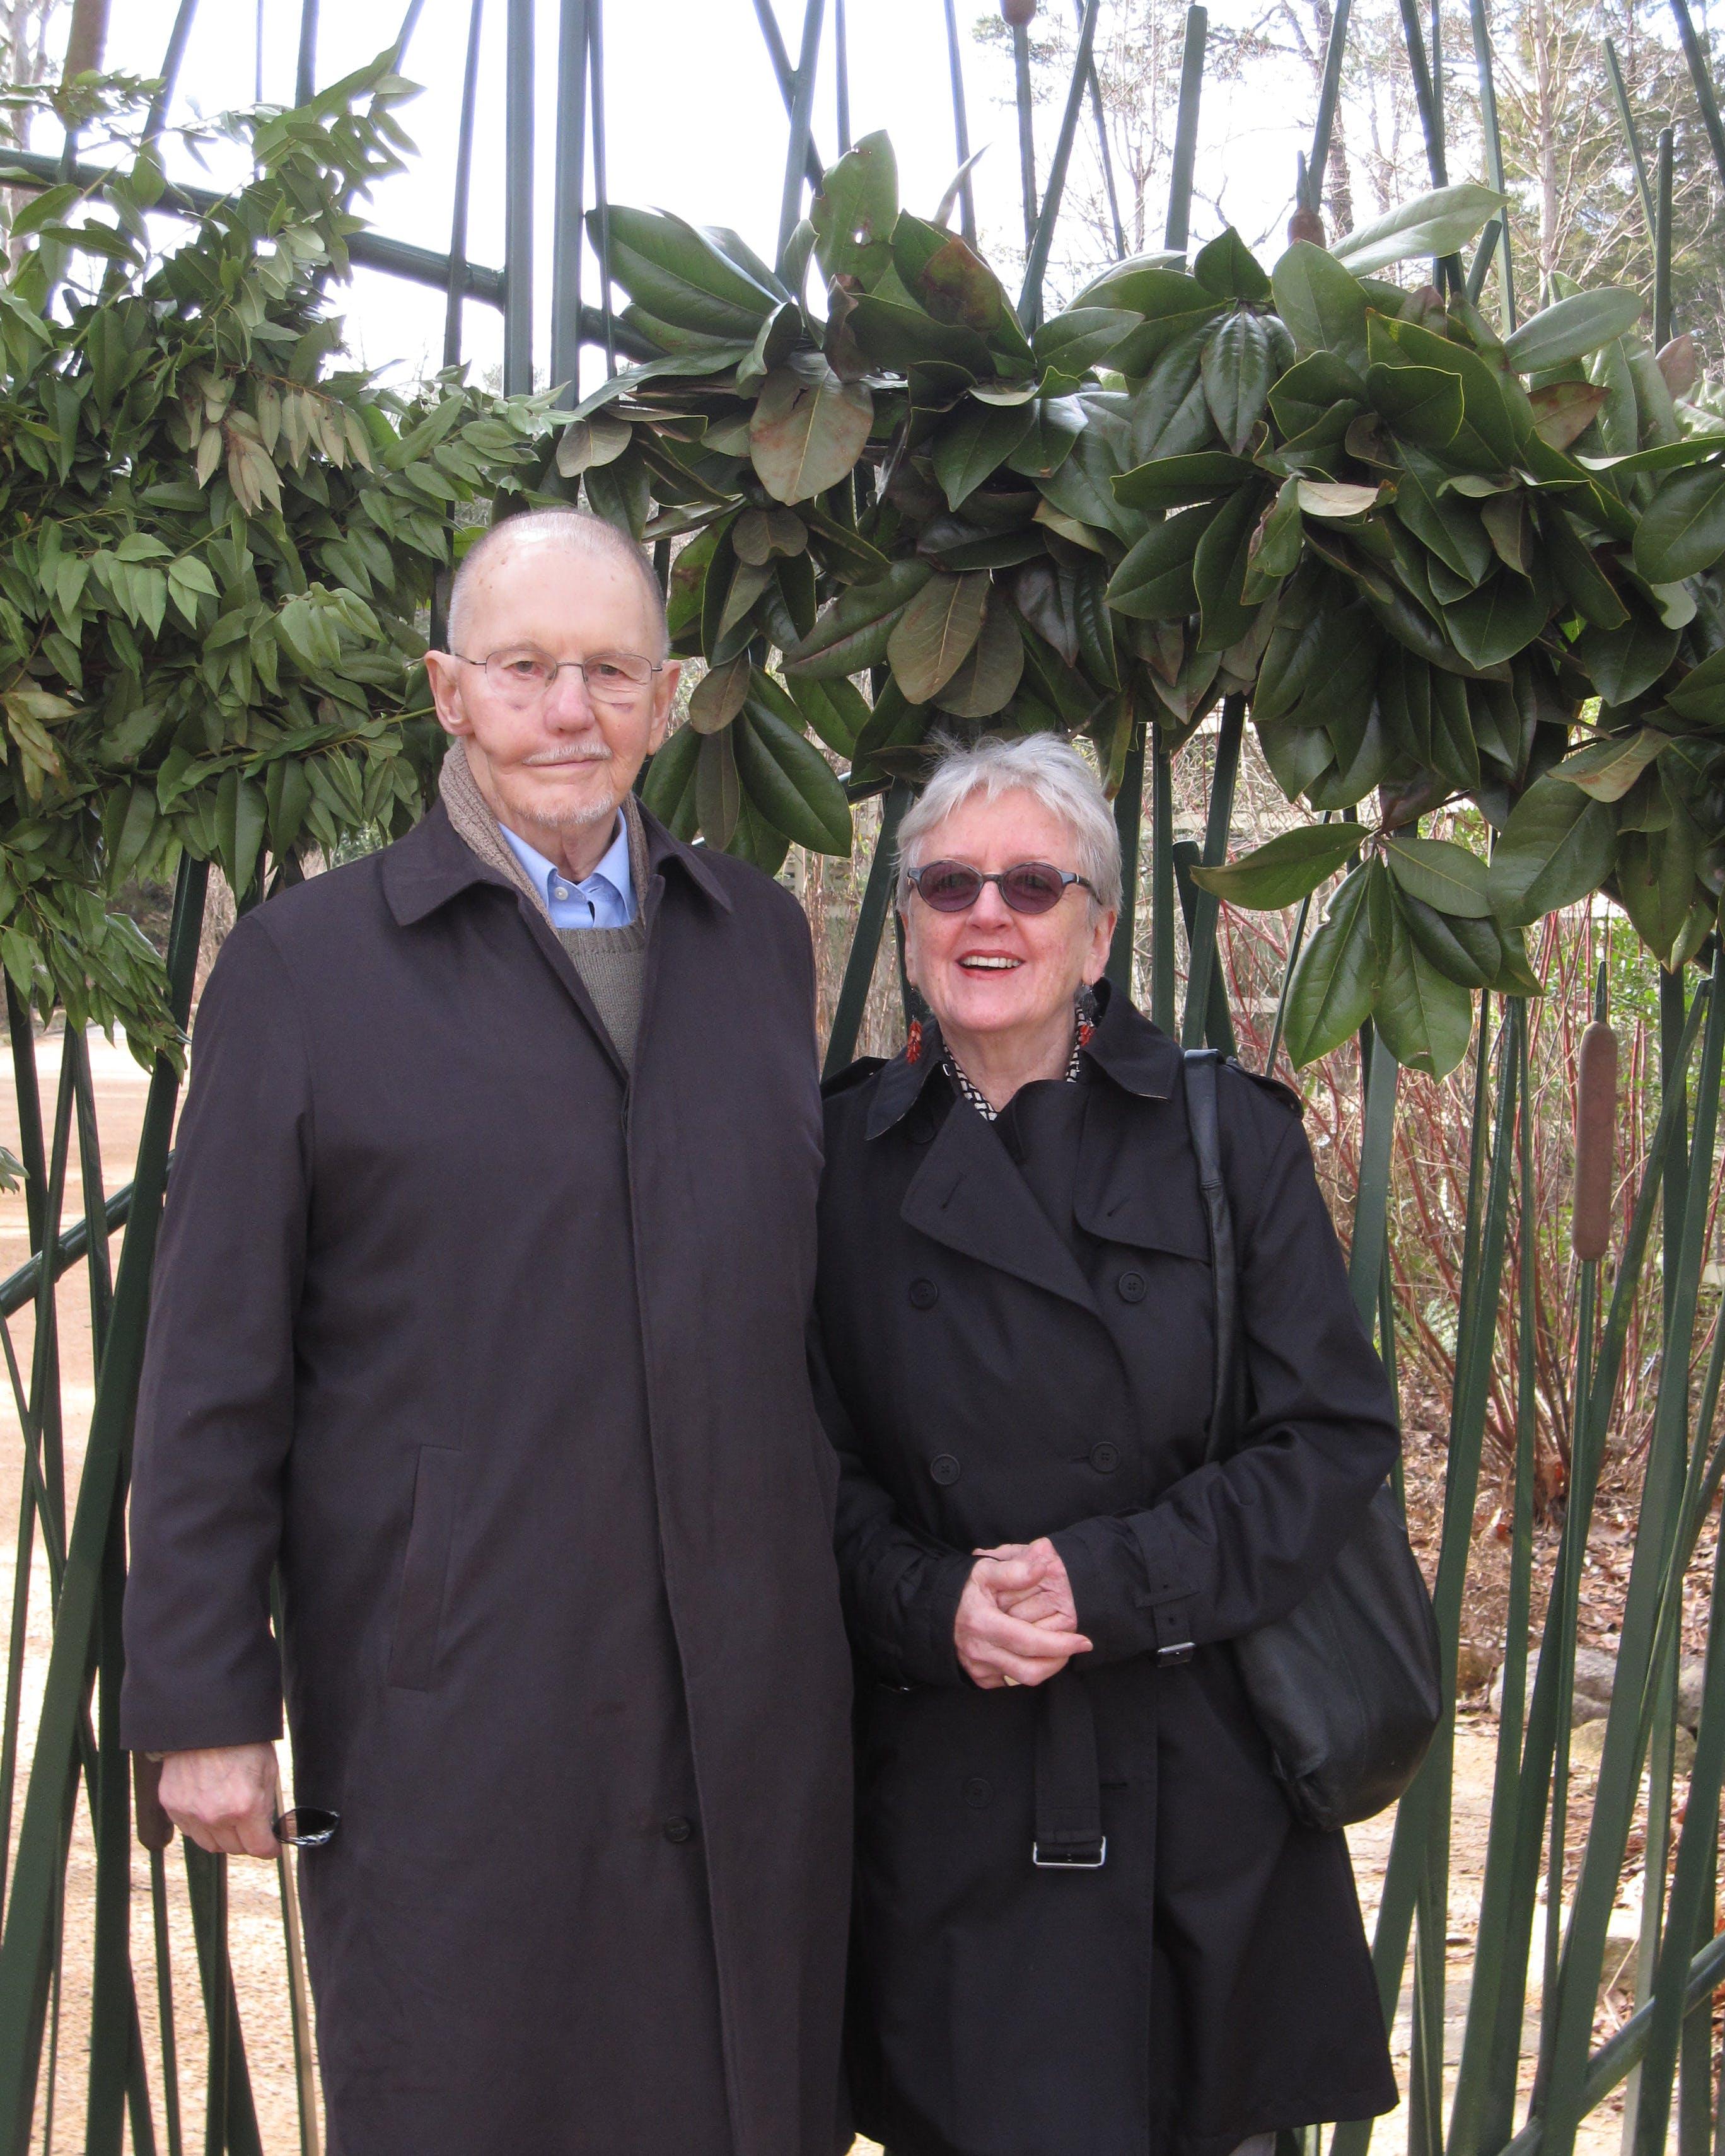 Lois Moran and Chuck Coates December 2009